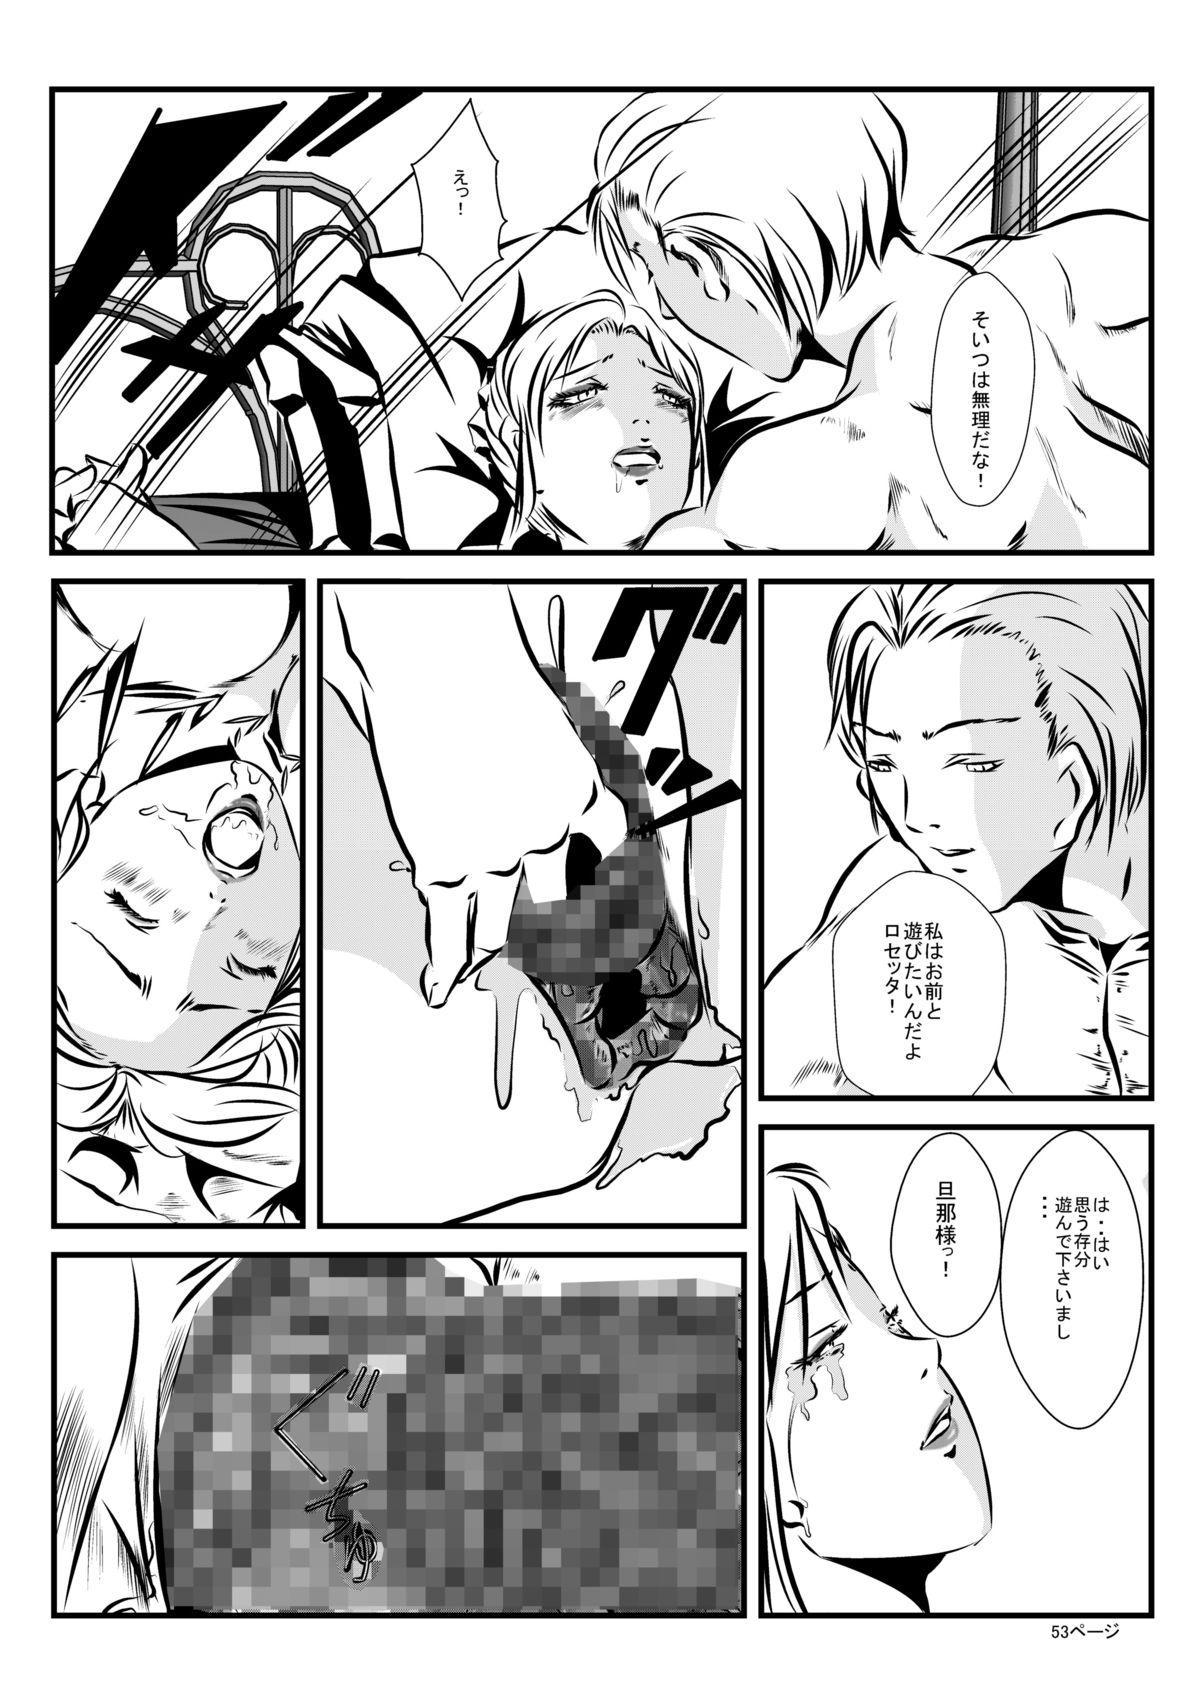 Loli Type no Jikkensitsu 51